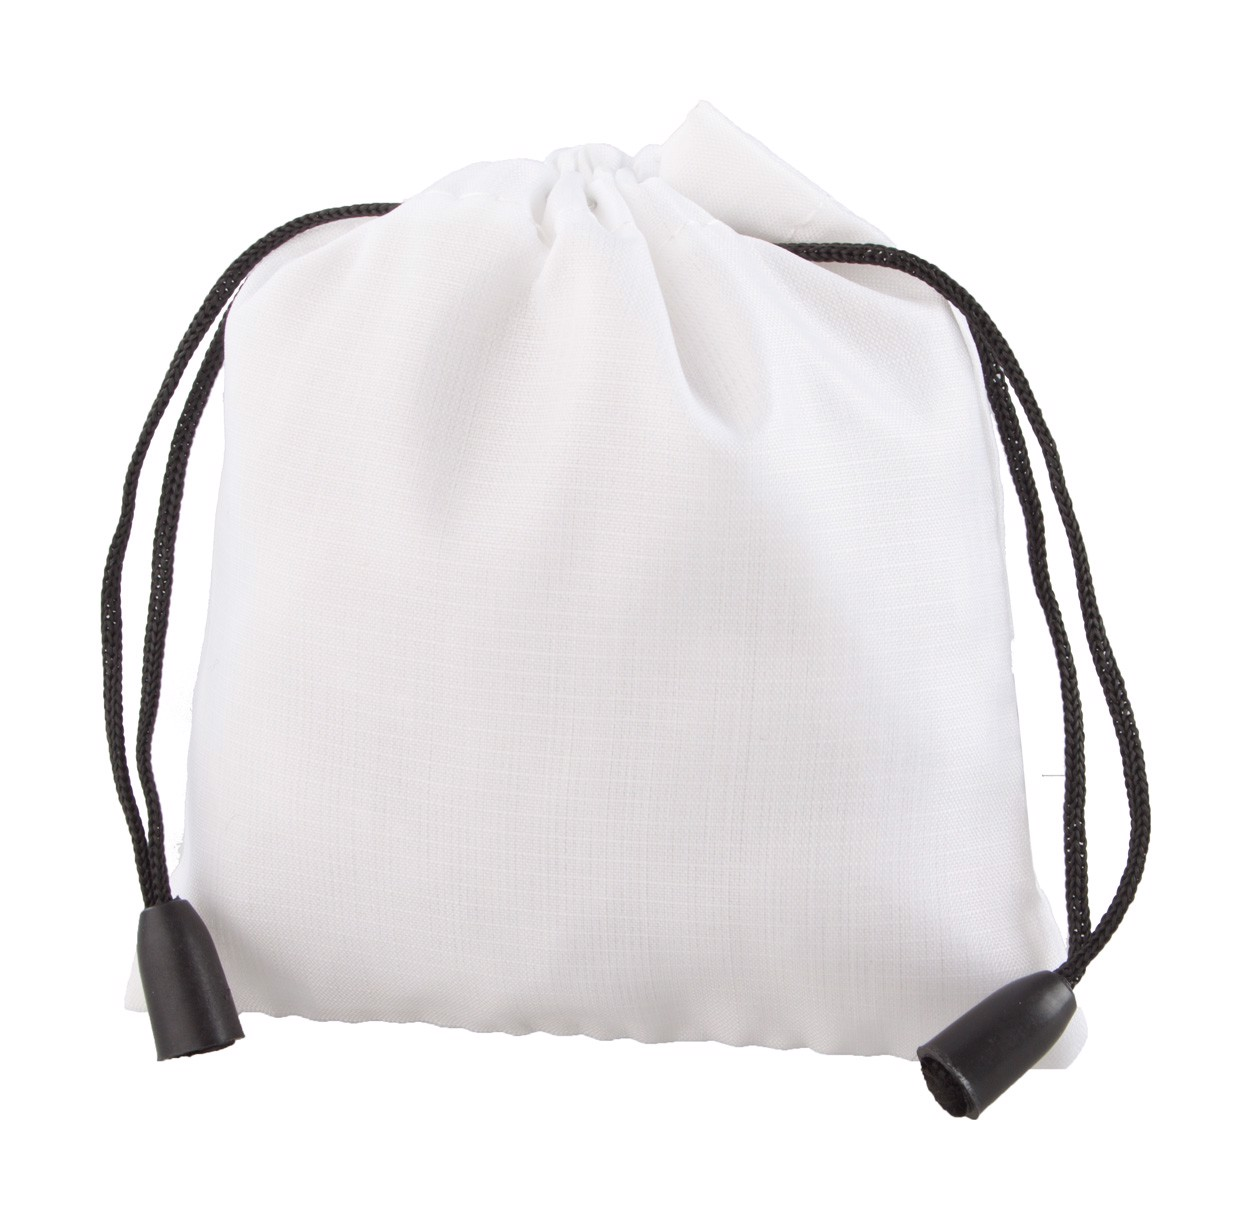 Pouch Kiping - White / Black